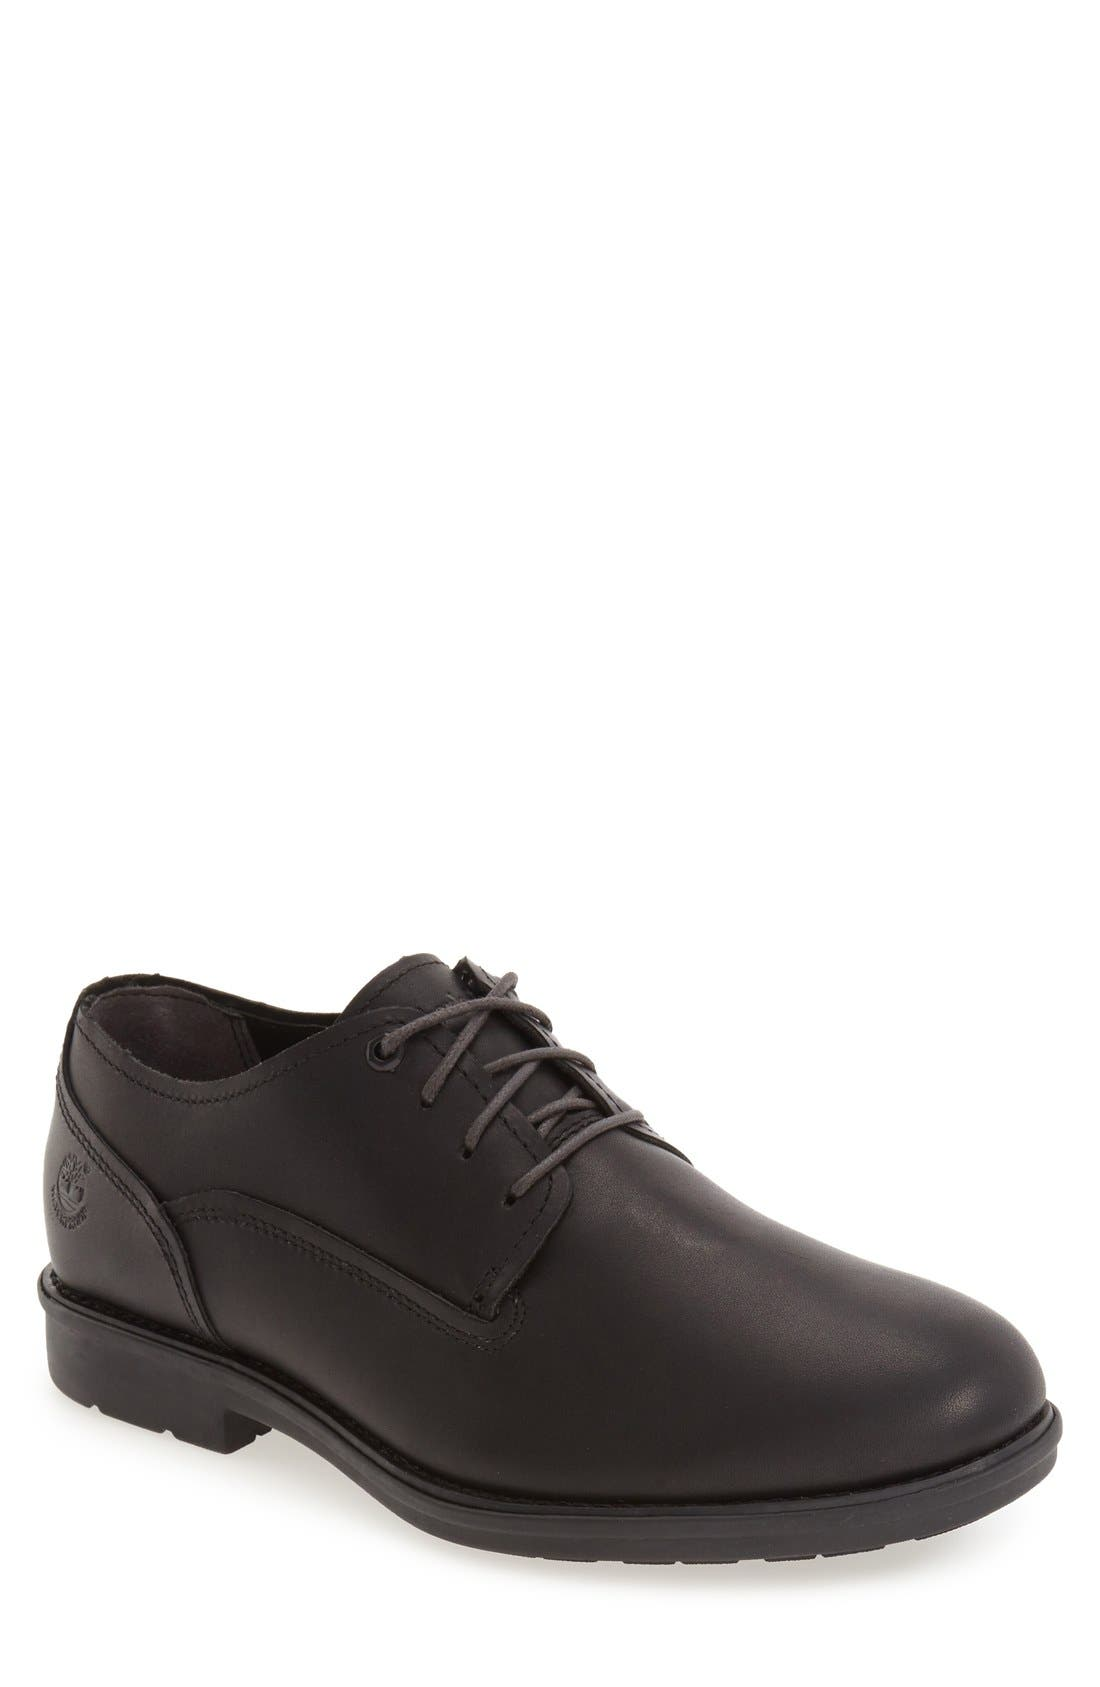 'Carter' Waterproof Plain-Toe Derby,                         Main,                         color, Black